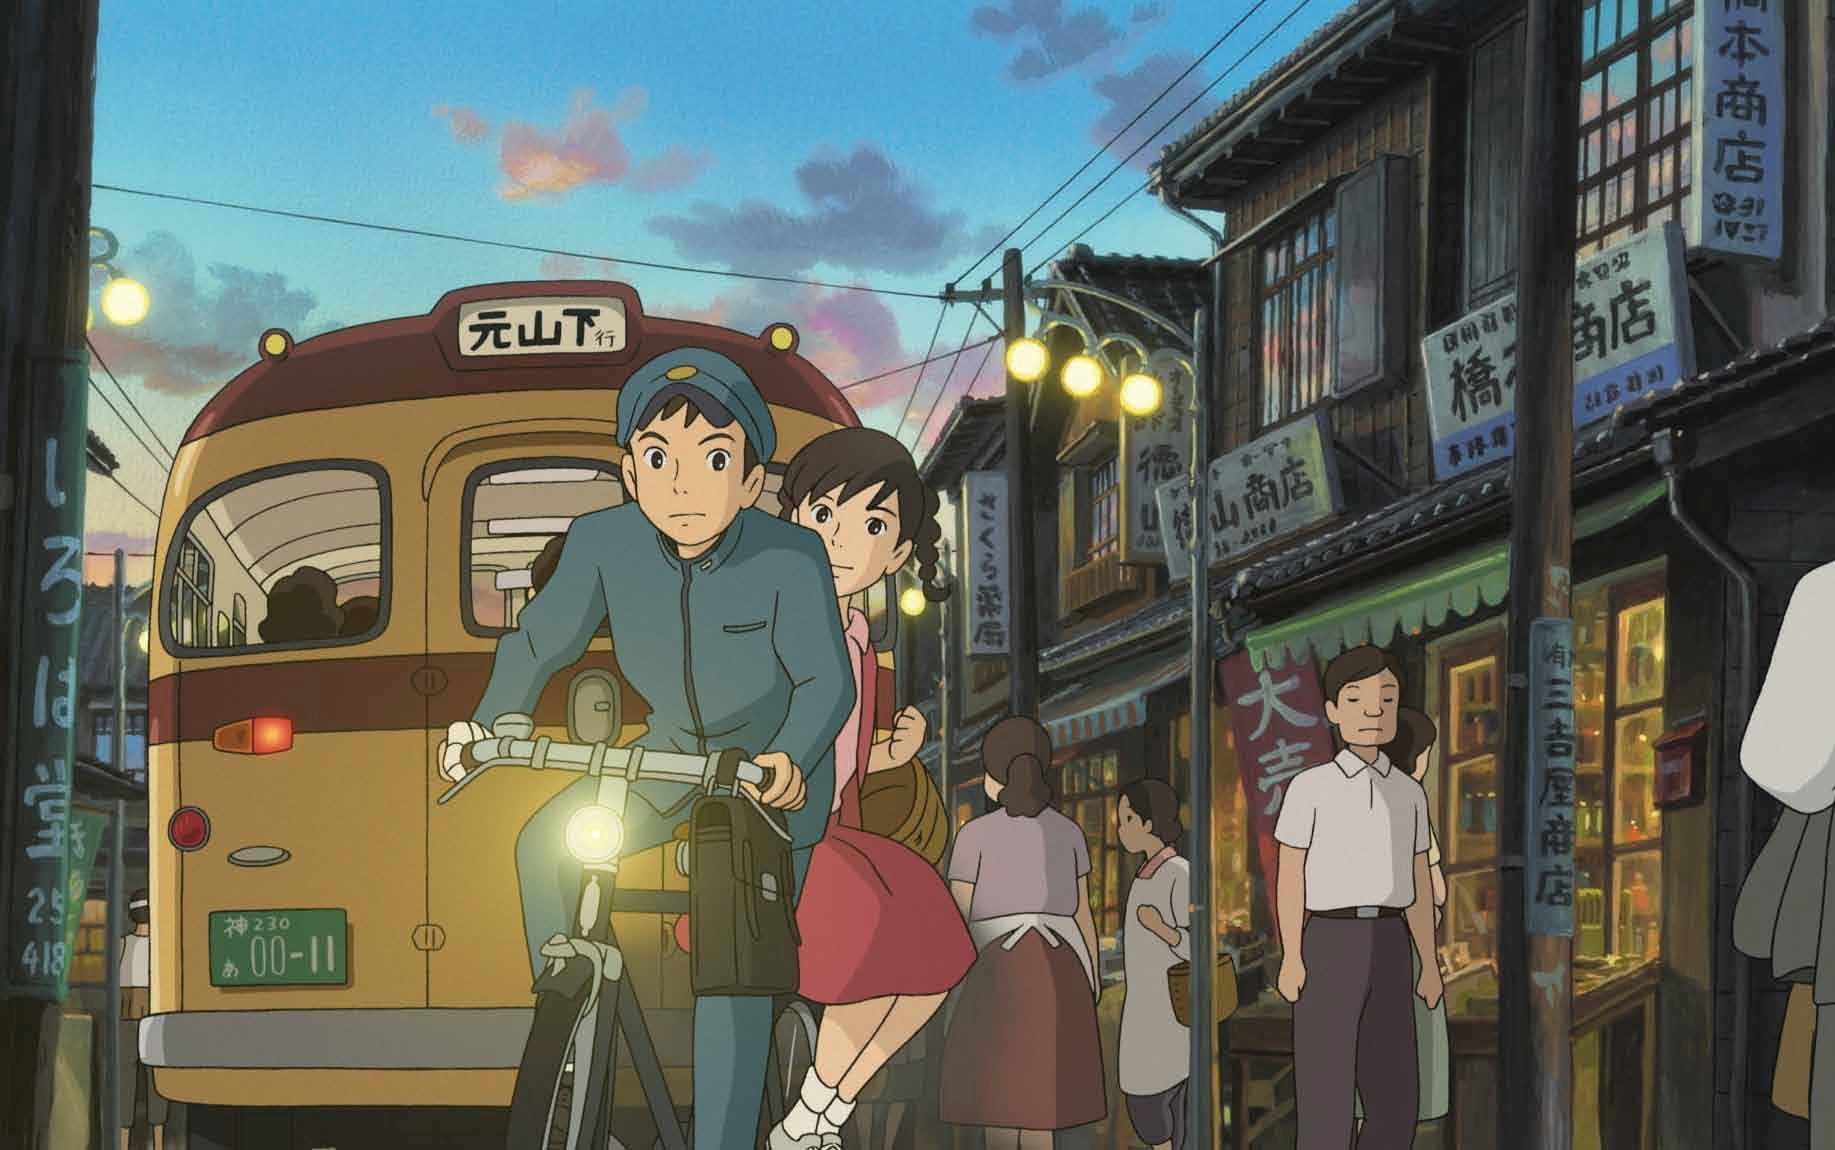 Der Mohnblumenberg / Studio Ghibli